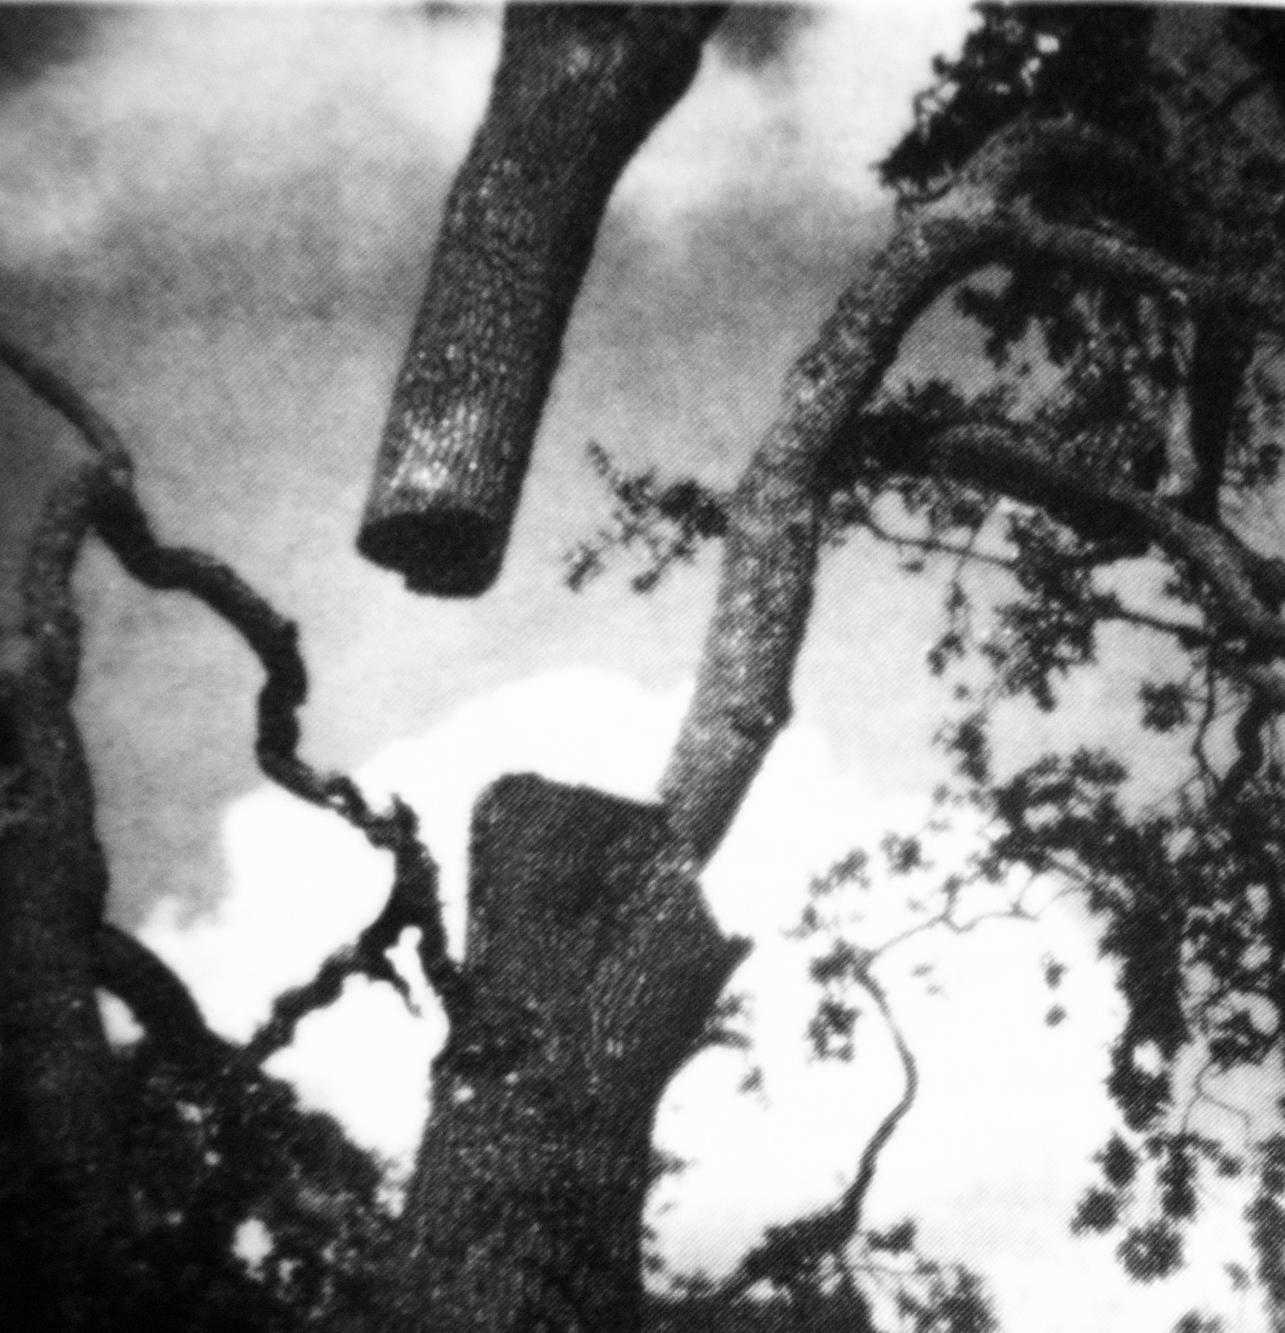 """Open Tree #1"" 2014-2018, stampa ai sali d'argento,  37,5 x 38,5 cm"